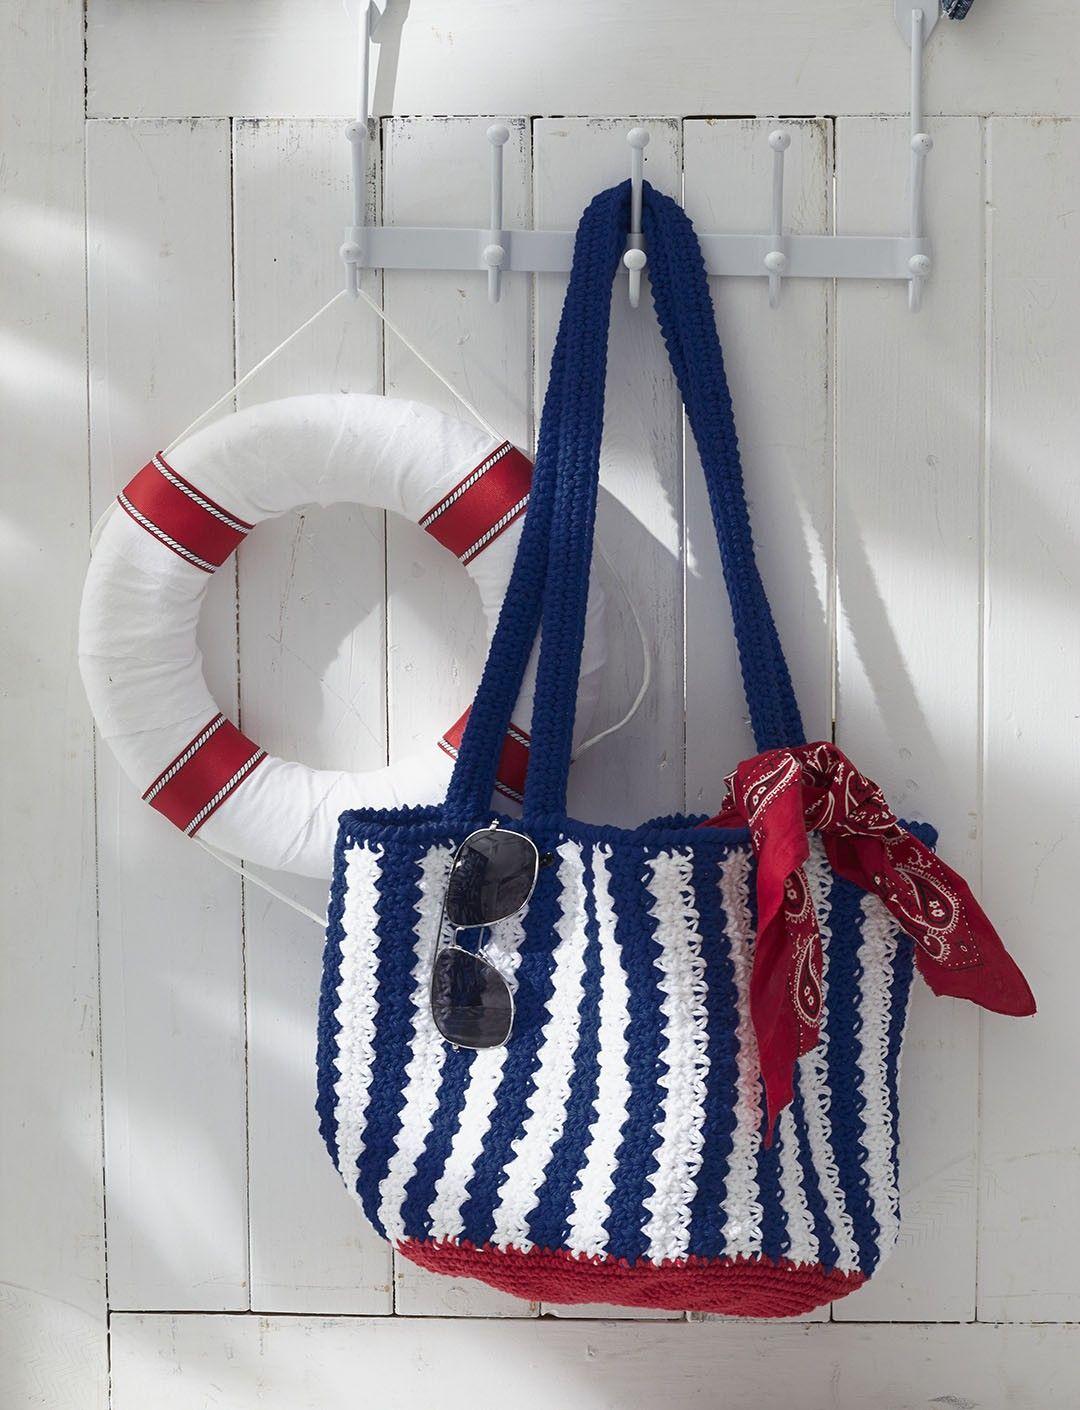 Yarnspirations lily nautical striped bag patterns yarnspirations lily nautical striped bag patterns yarnspirations bankloansurffo Gallery